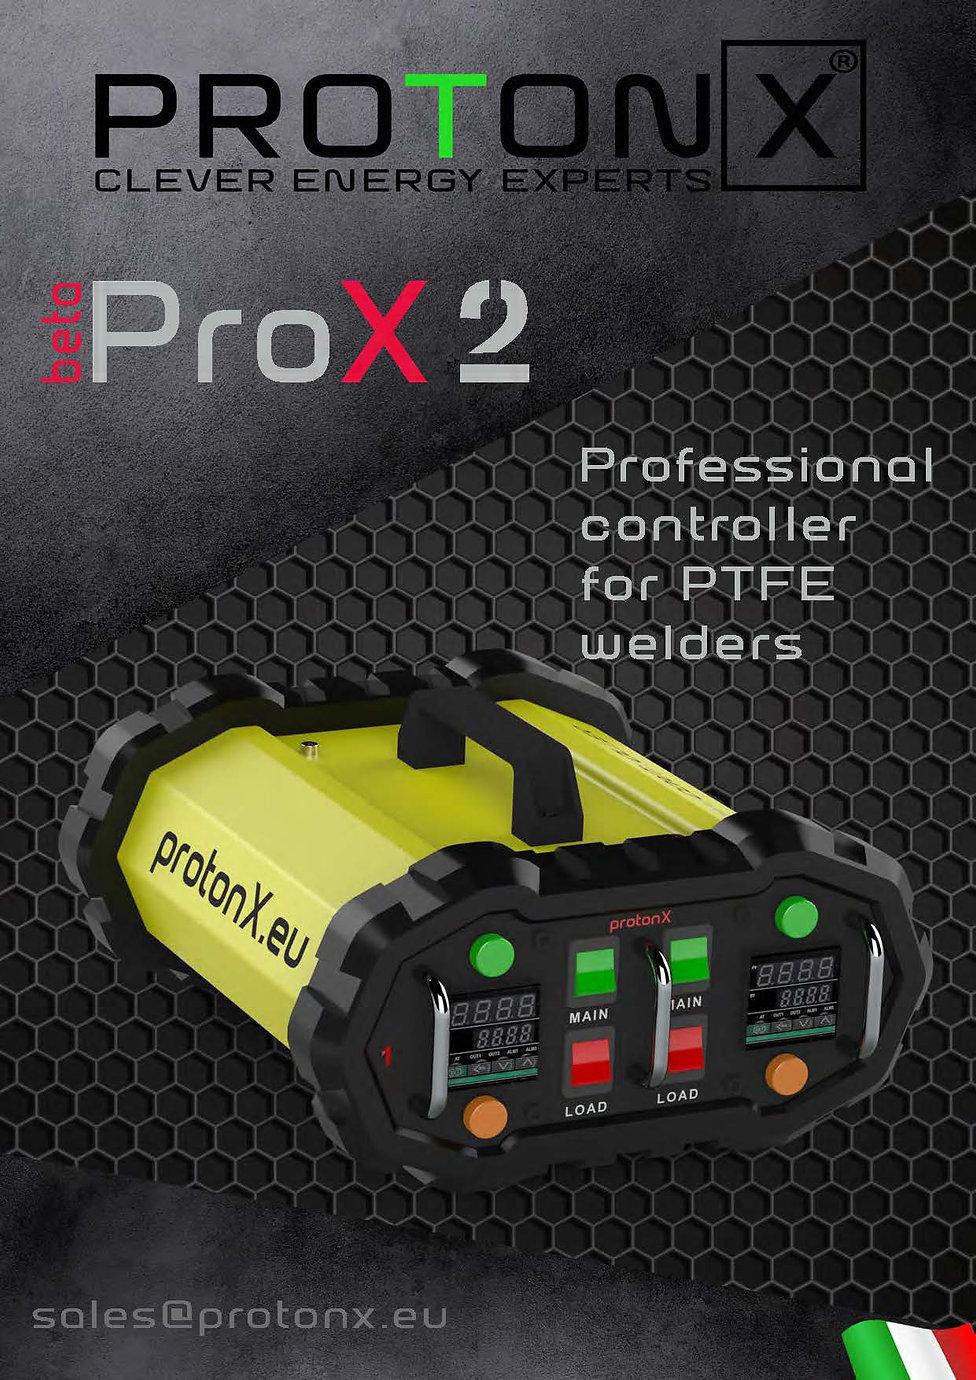 PROX2